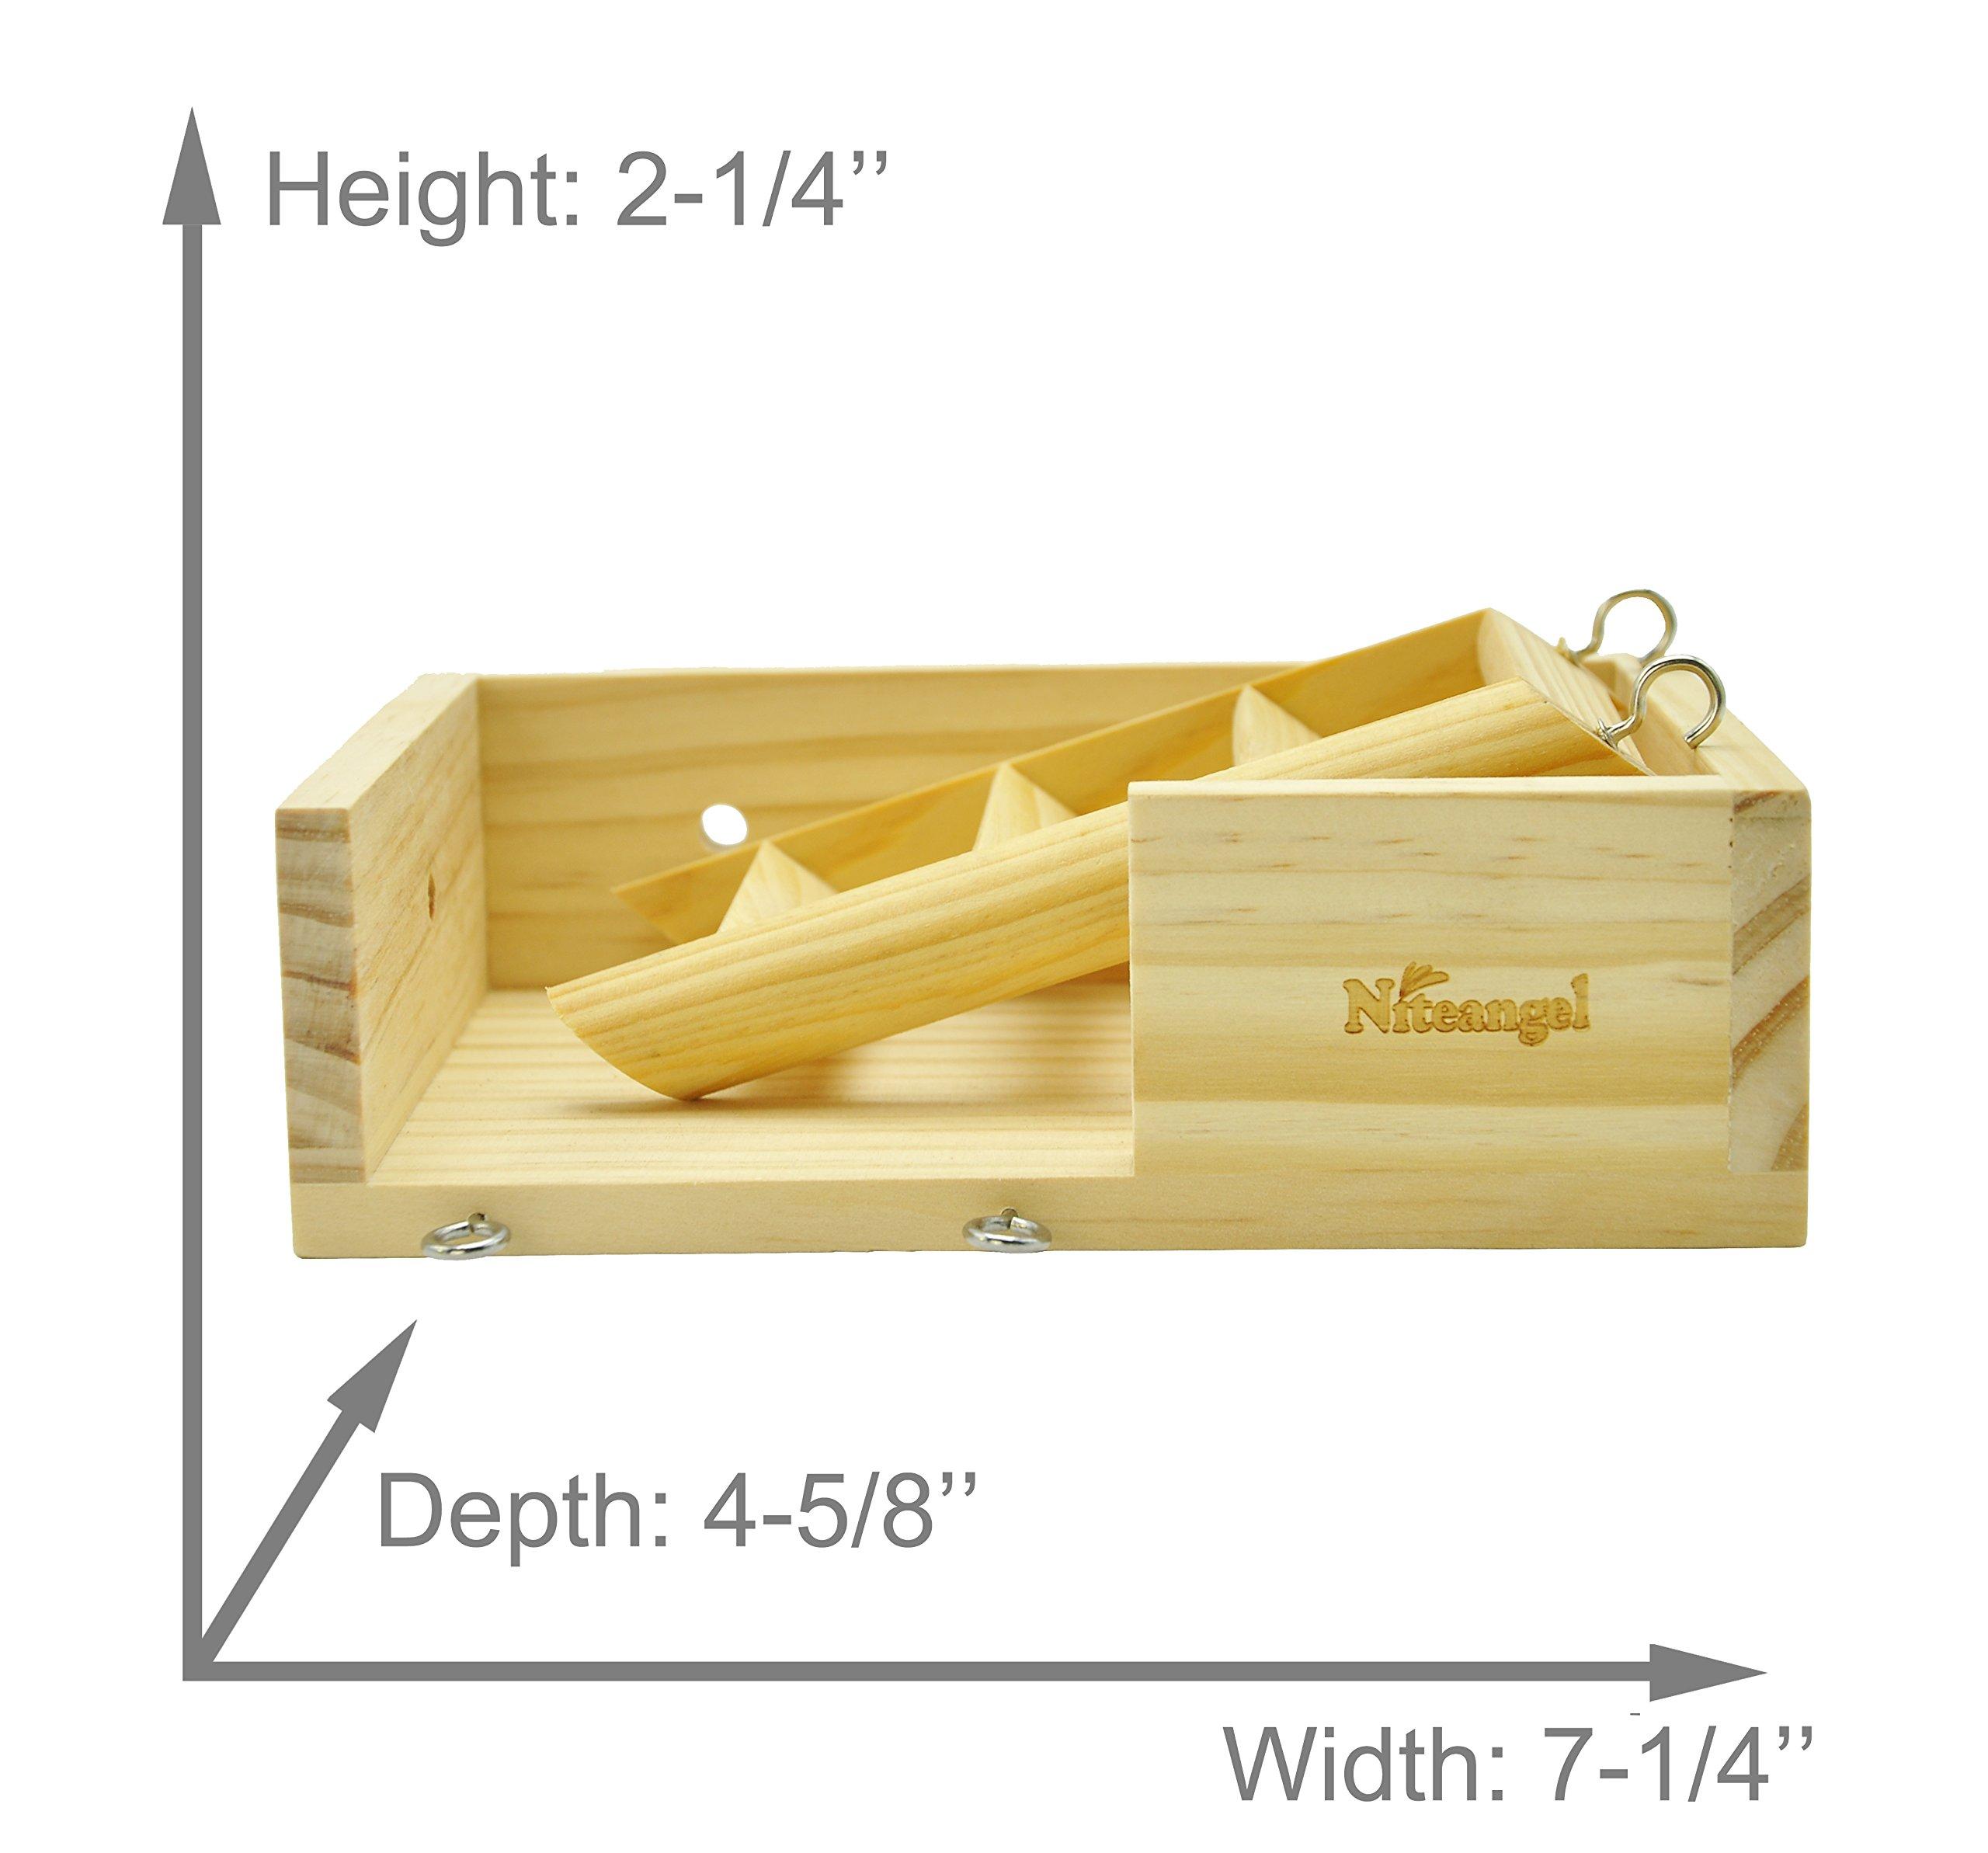 Niteangel Small Animal Wooden Platform, Climbing Kits by Niteangel (Image #1)